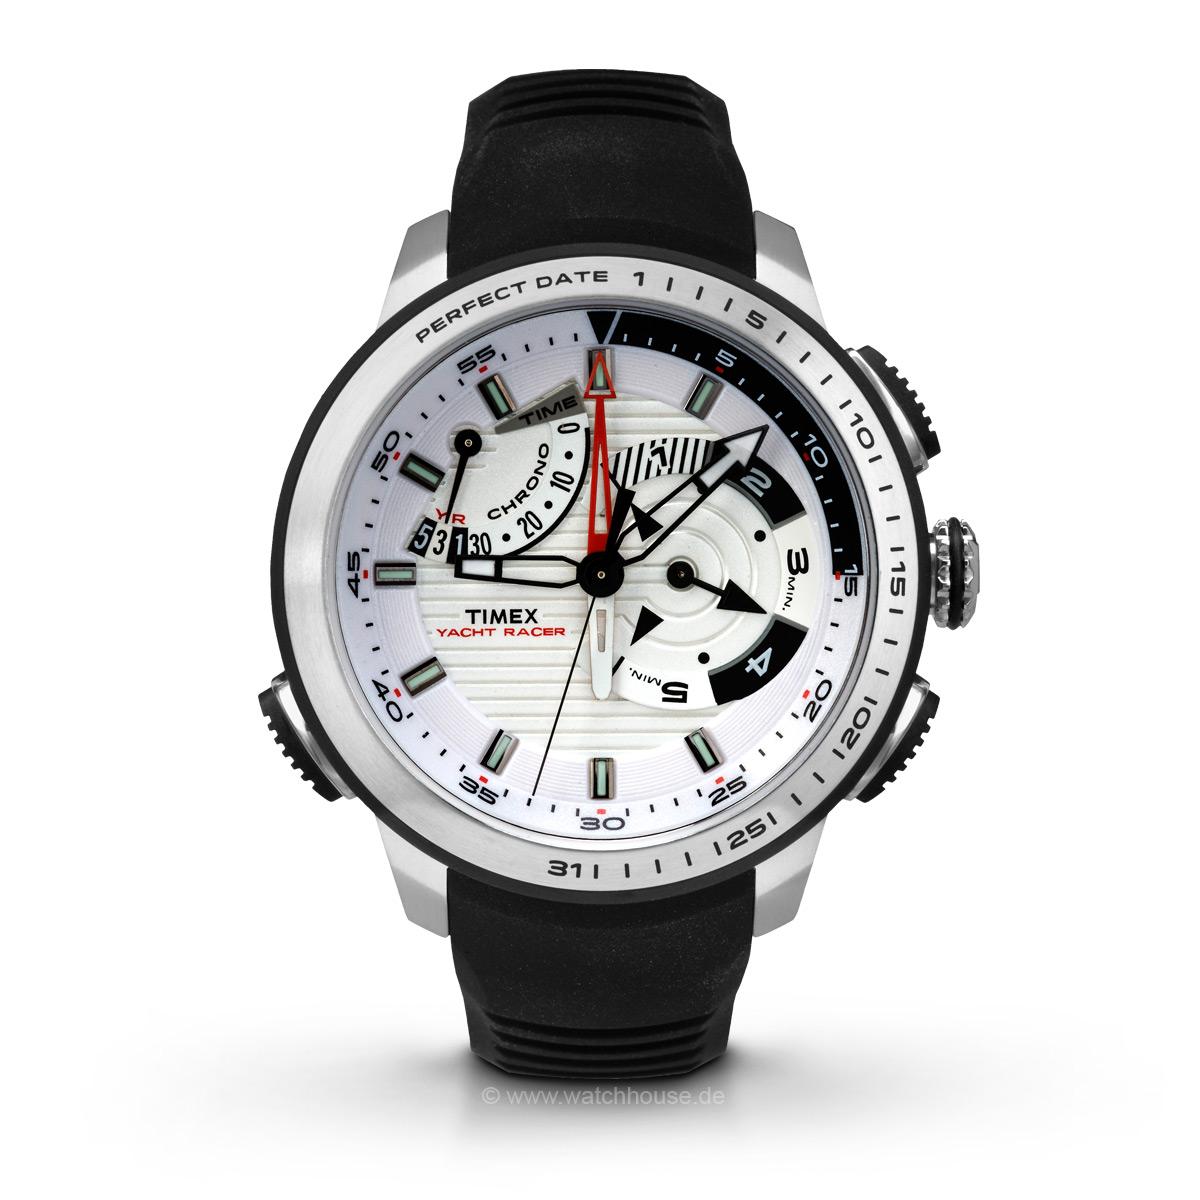 Timex Intelligent Quartz Yacht Racer TW2P44600 Herren Armbanduhr